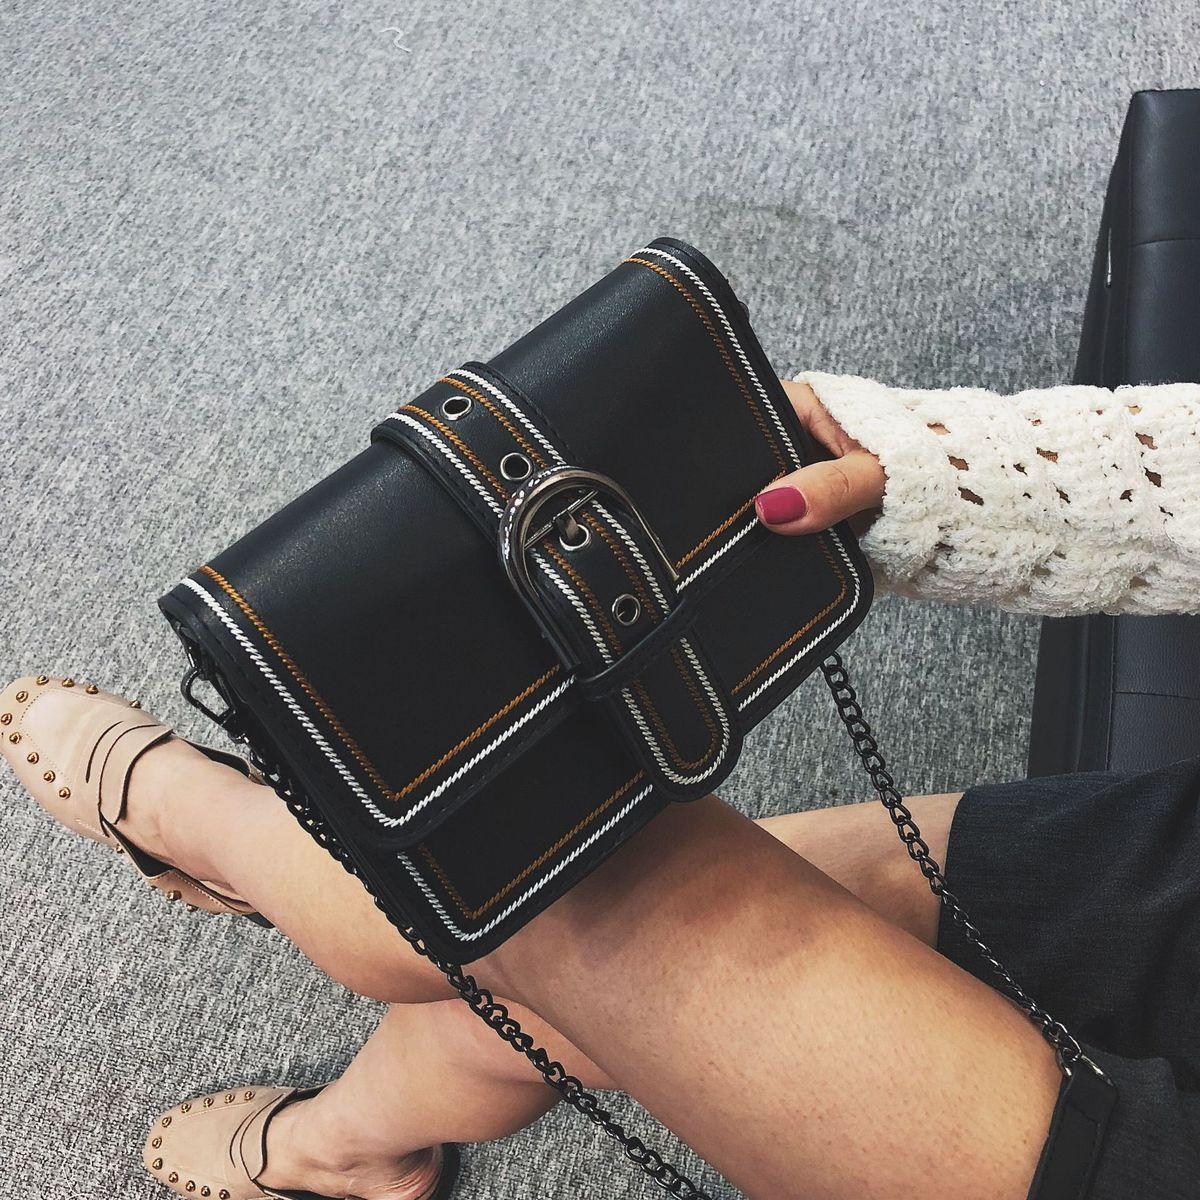 a063eab1d1b7 2018 New SquareFashion Bags Women Luxury Brand Lady Leather Handbags Chain Single  Shoulder Satchel Bag Online with  29.95 Piece on Yuncai5566 s Store ...